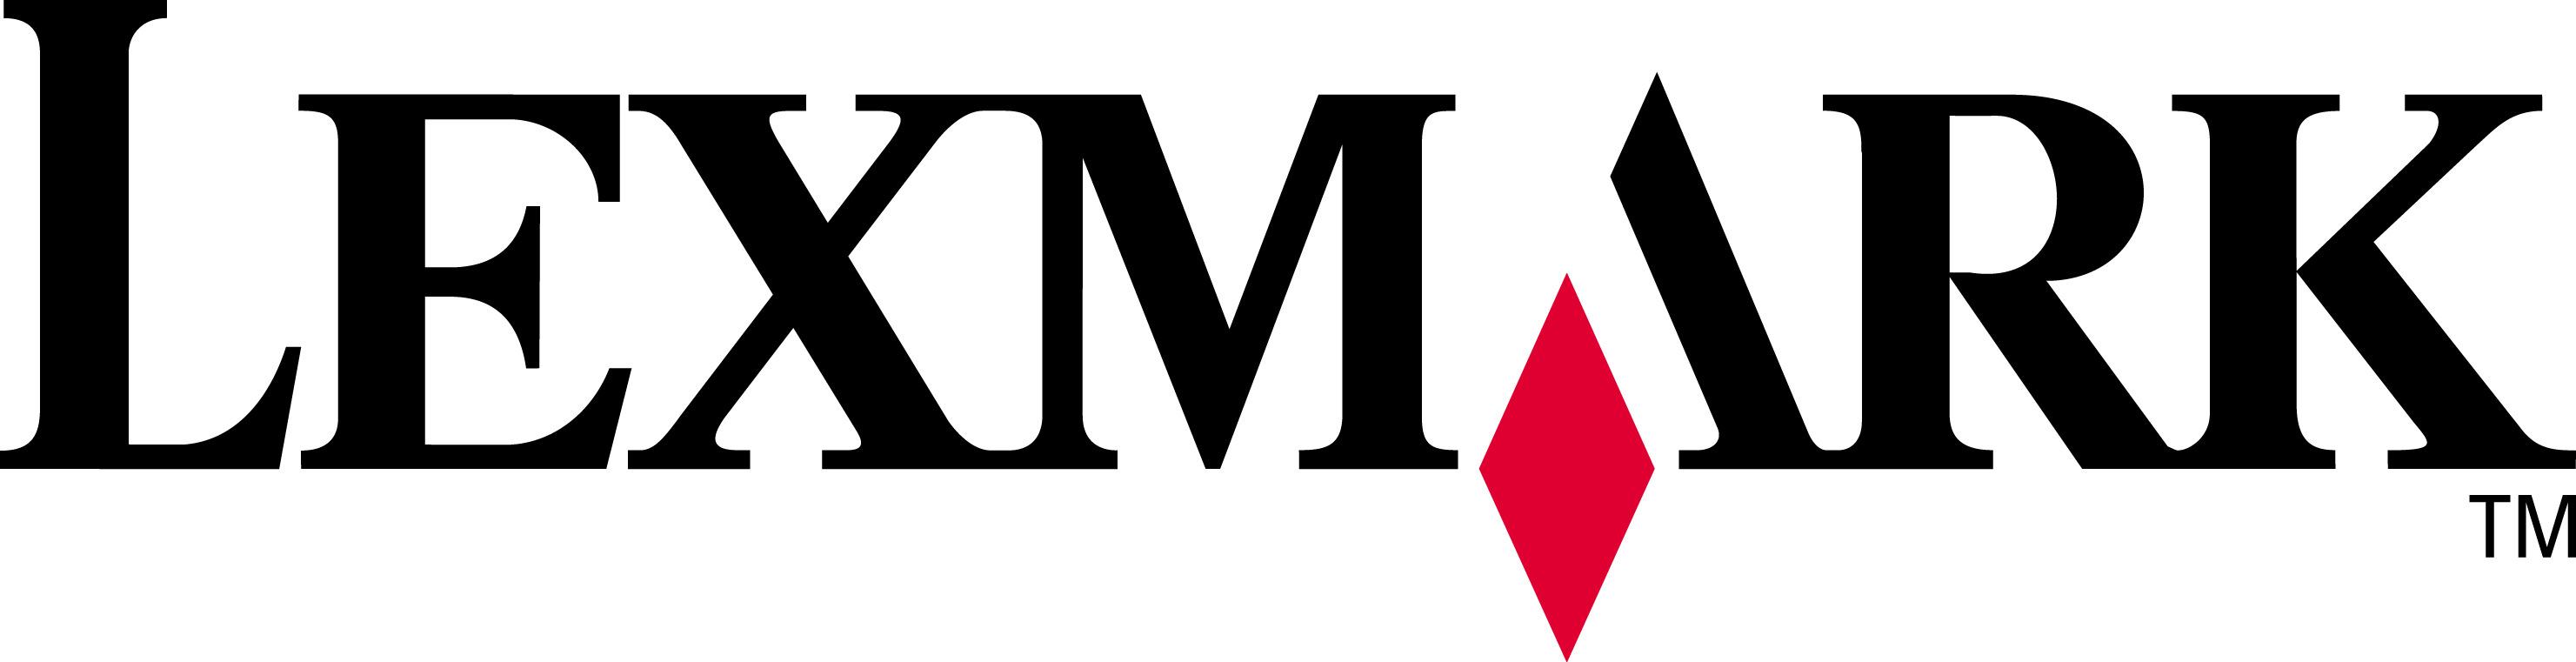 Lexmarkova nova poslovna usmeritev prinaša odlične rezultate